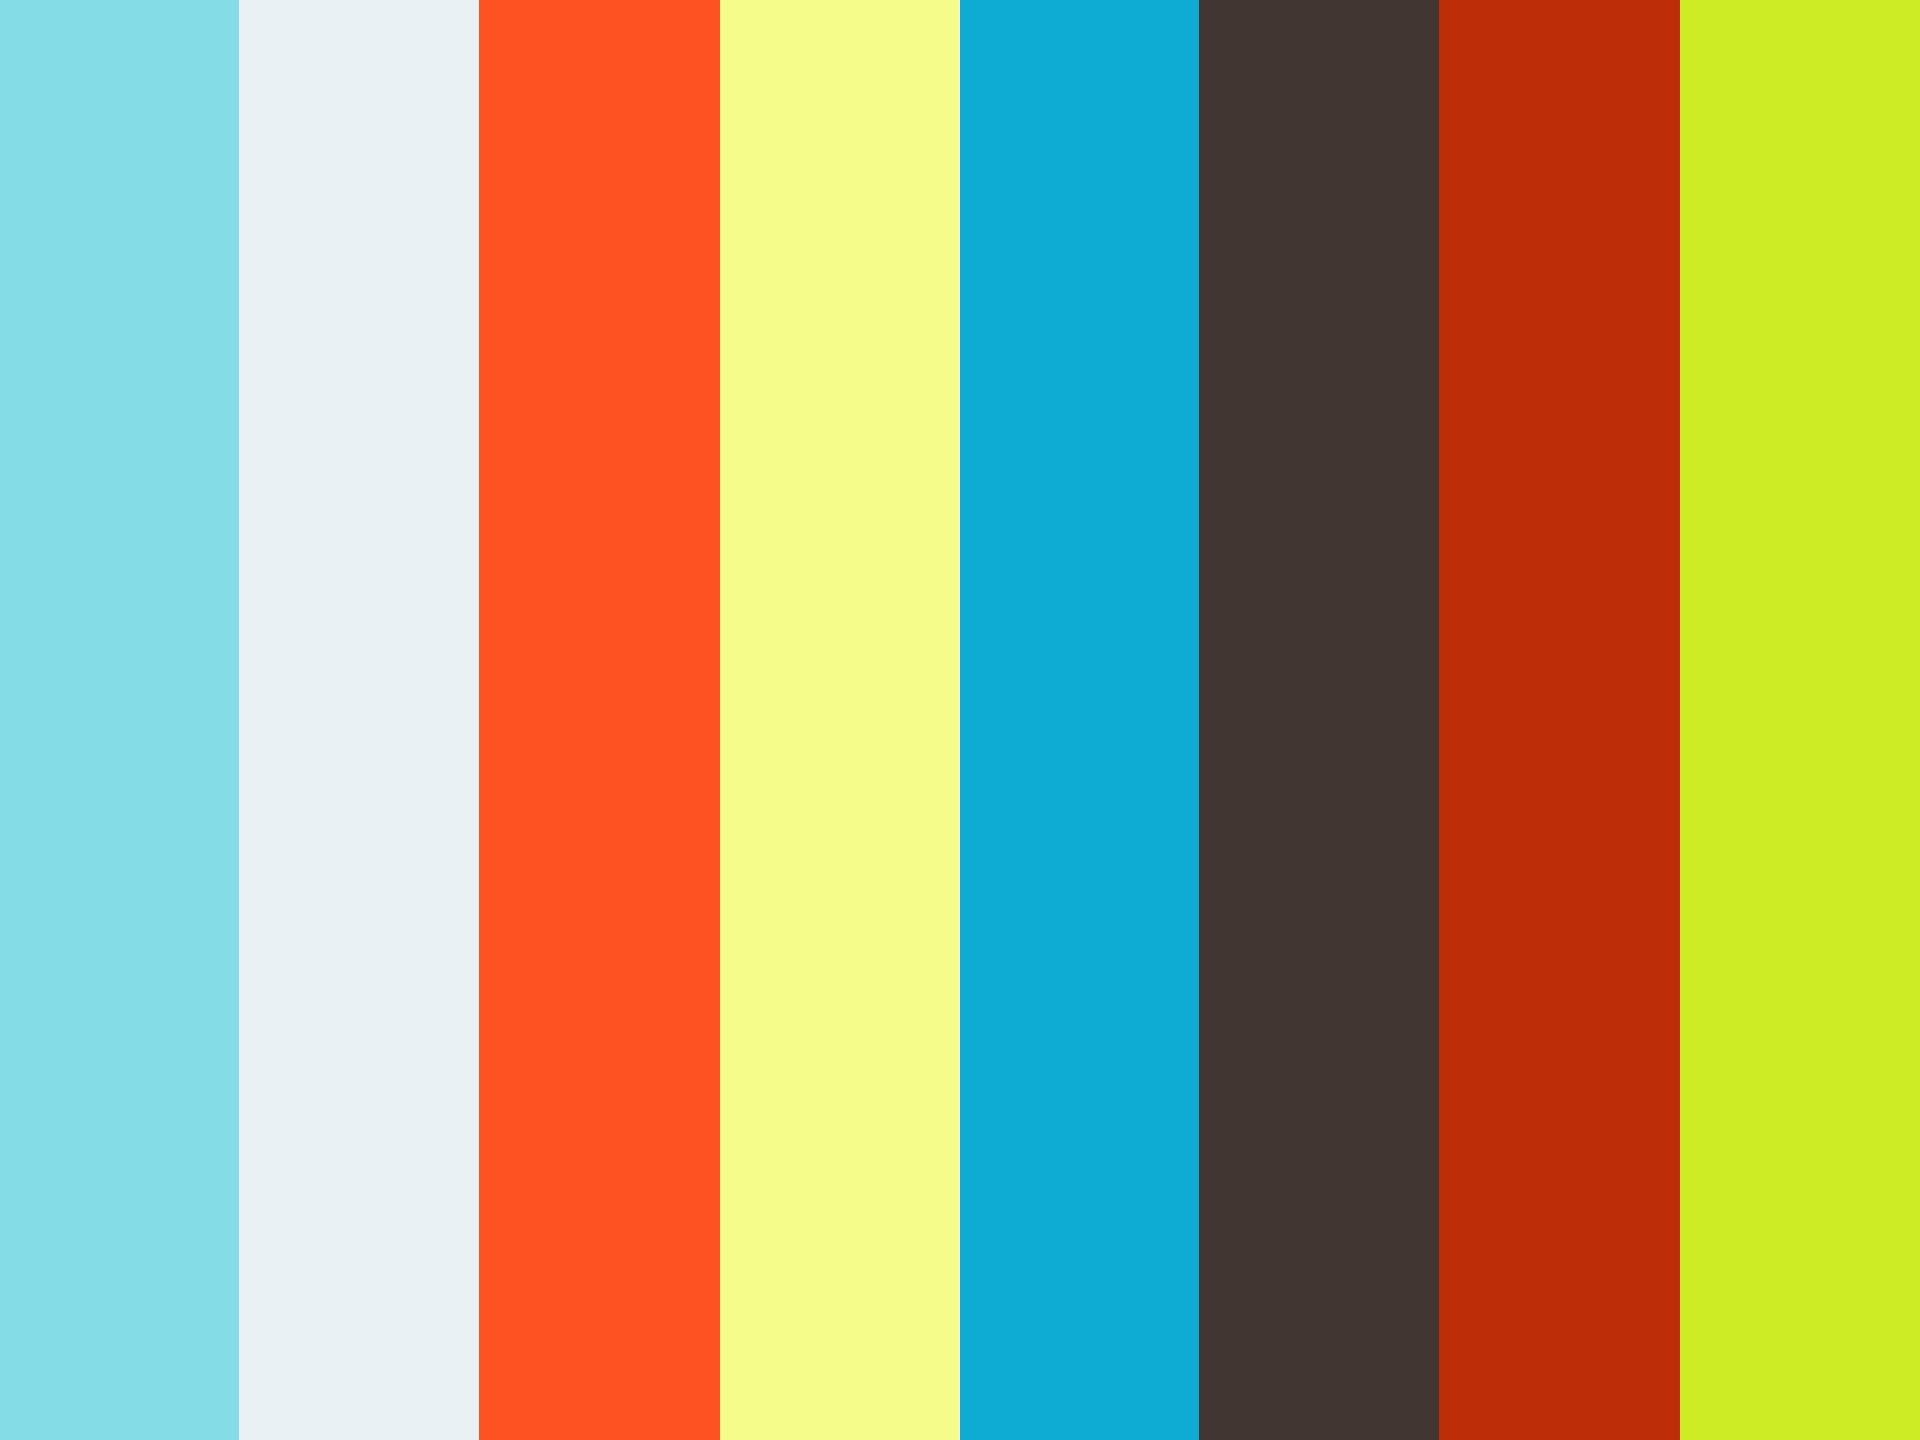 Backscatter FLEX DIVE Filter for GoPro Hero 4 and Hero 3+